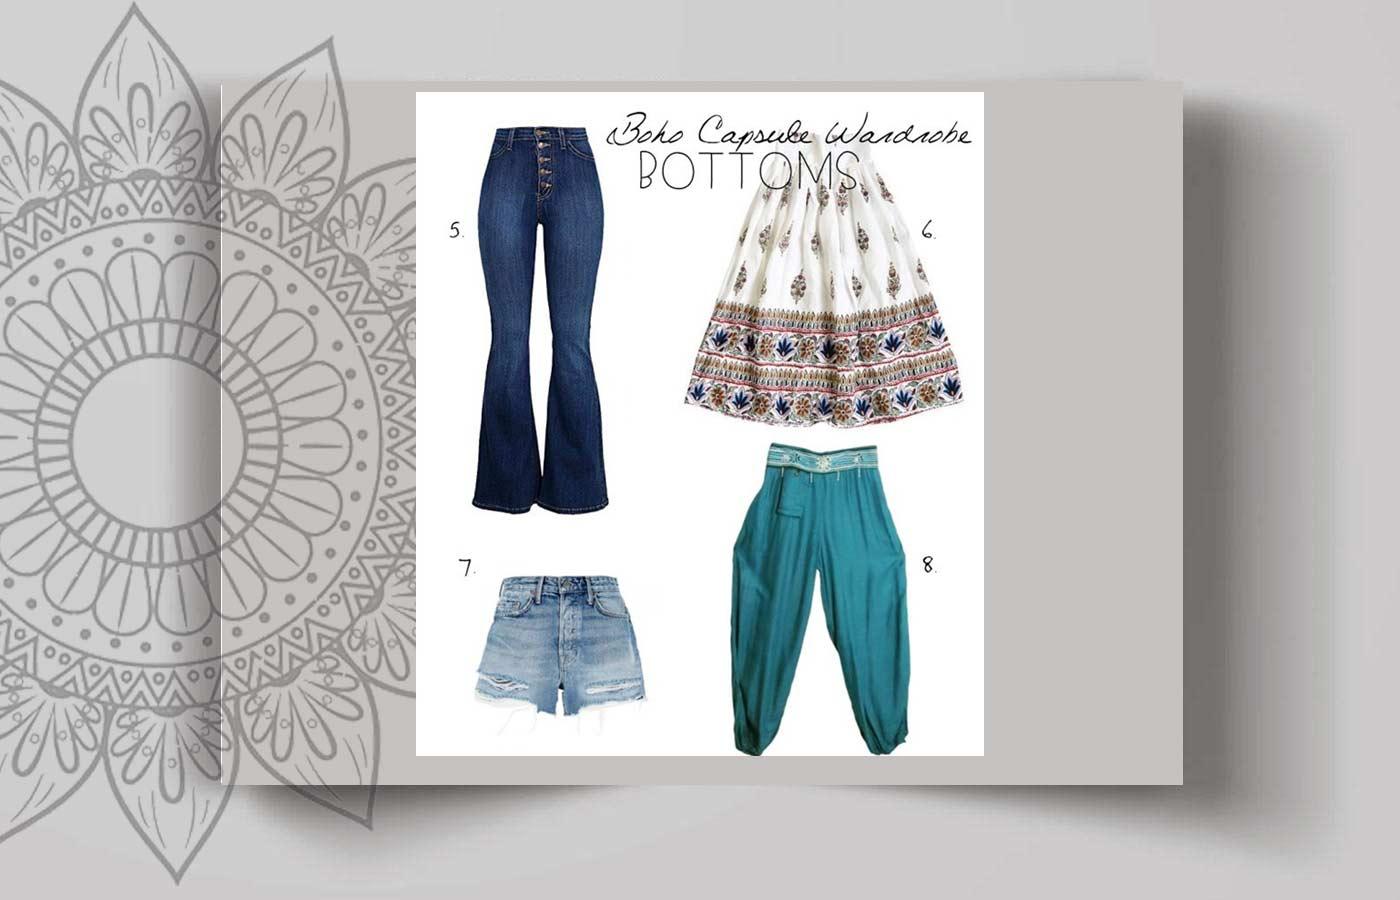 bohemian women style 13 - استایل بوهو زنانه